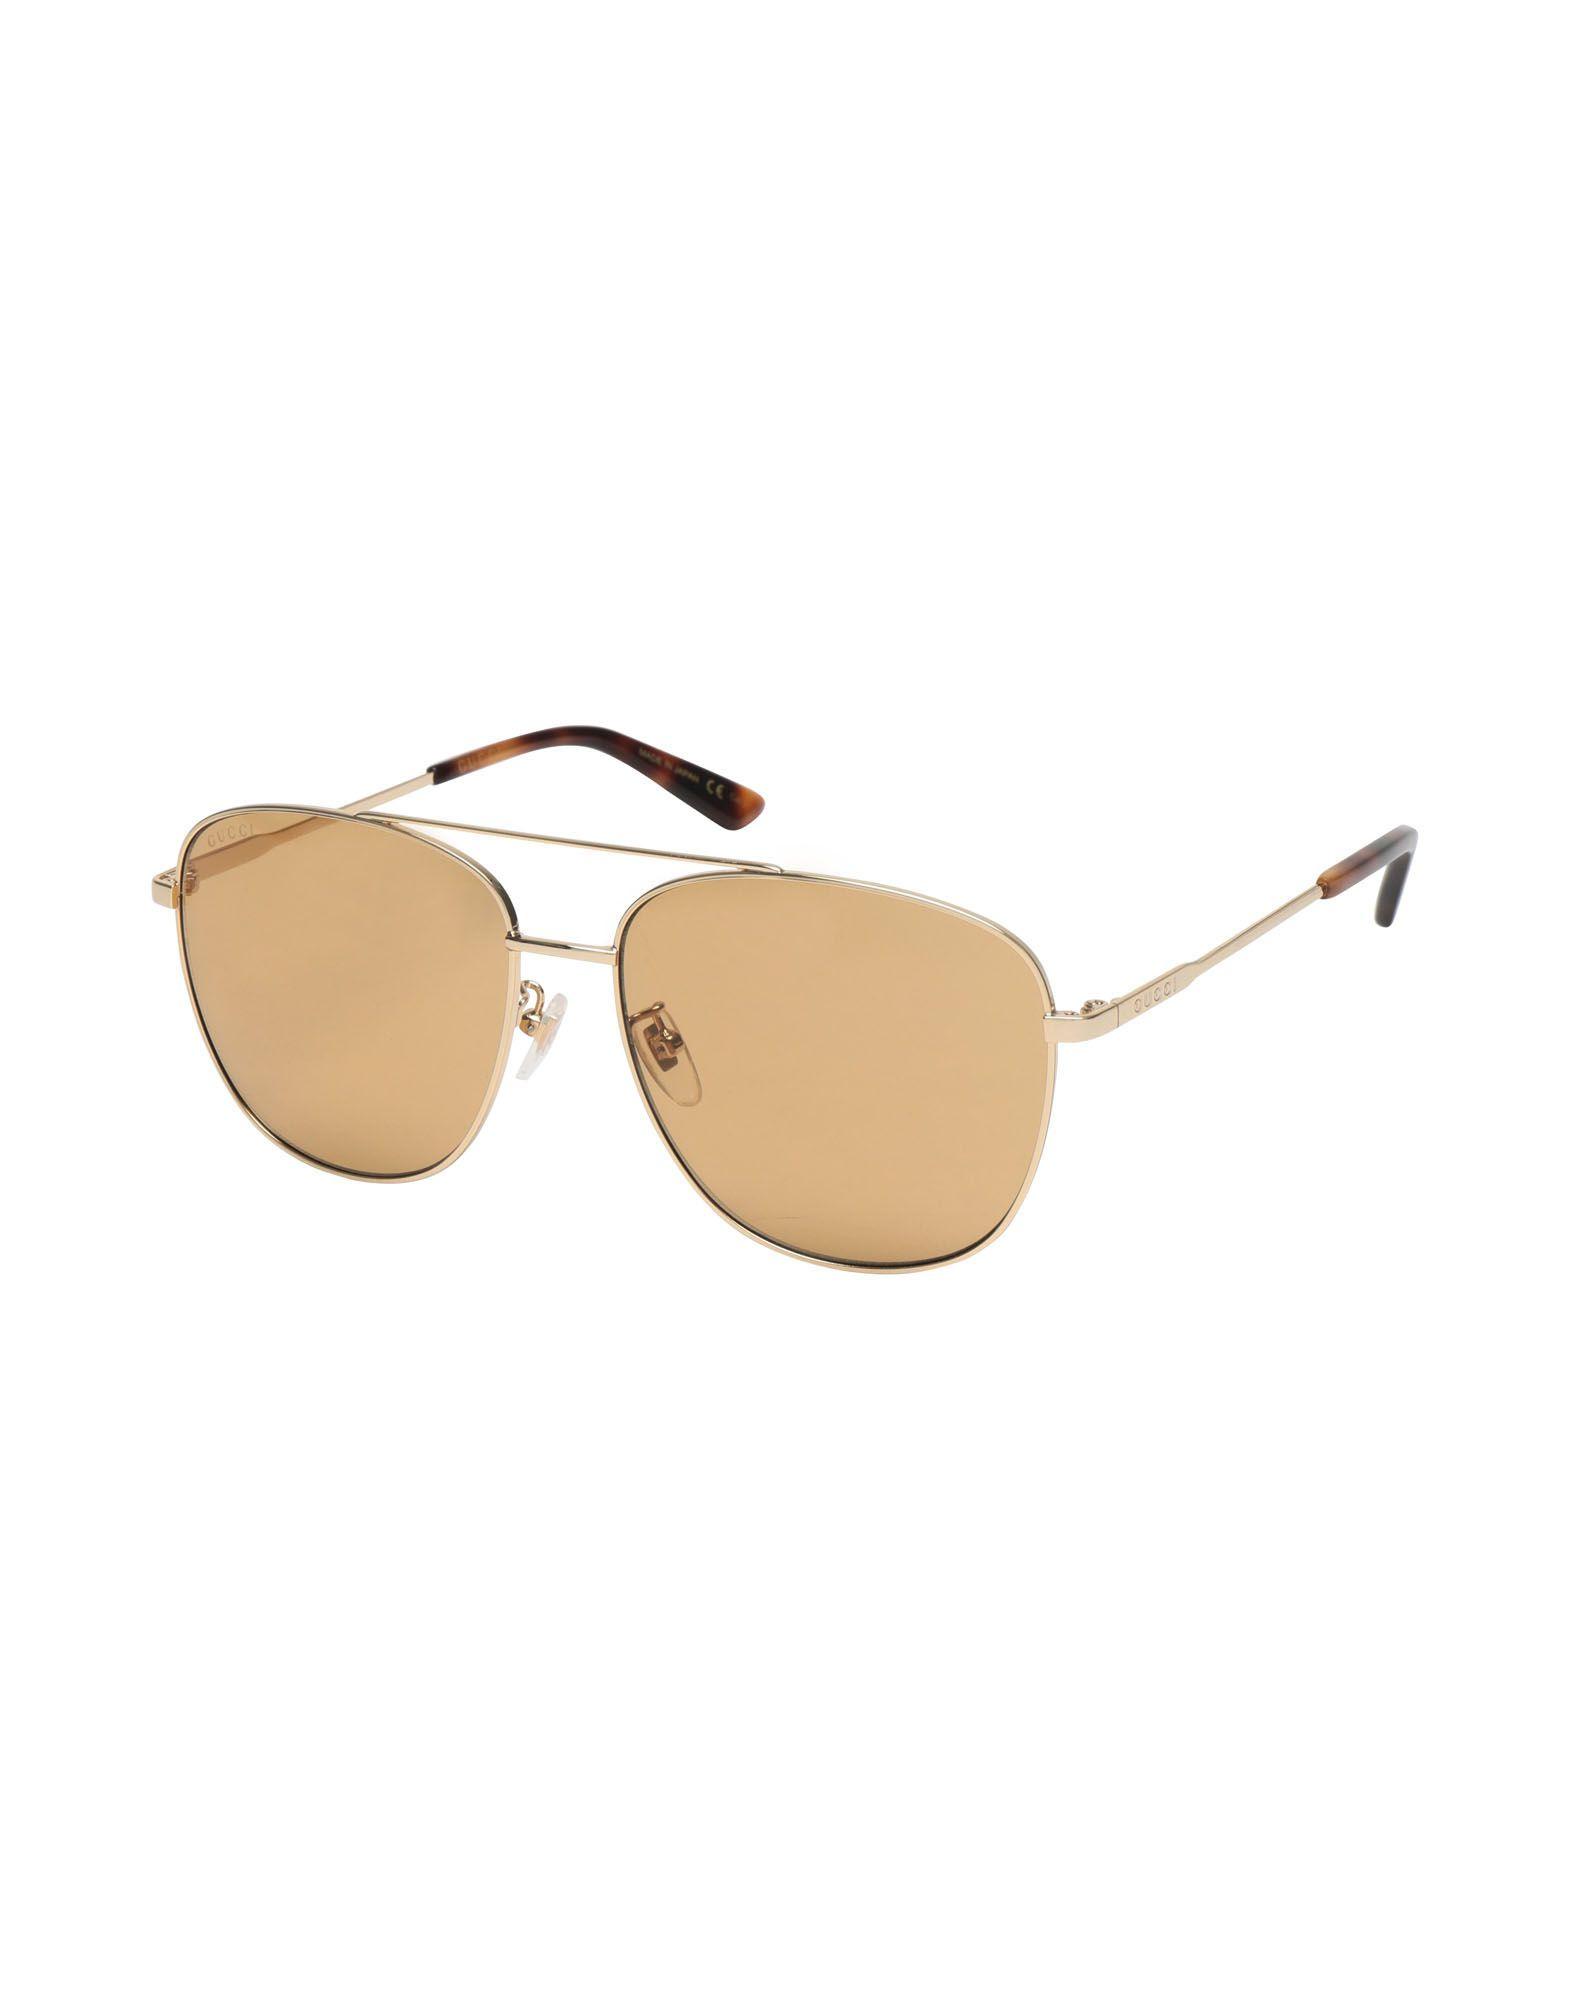 Фото - GUCCI Солнечные очки 3d очки